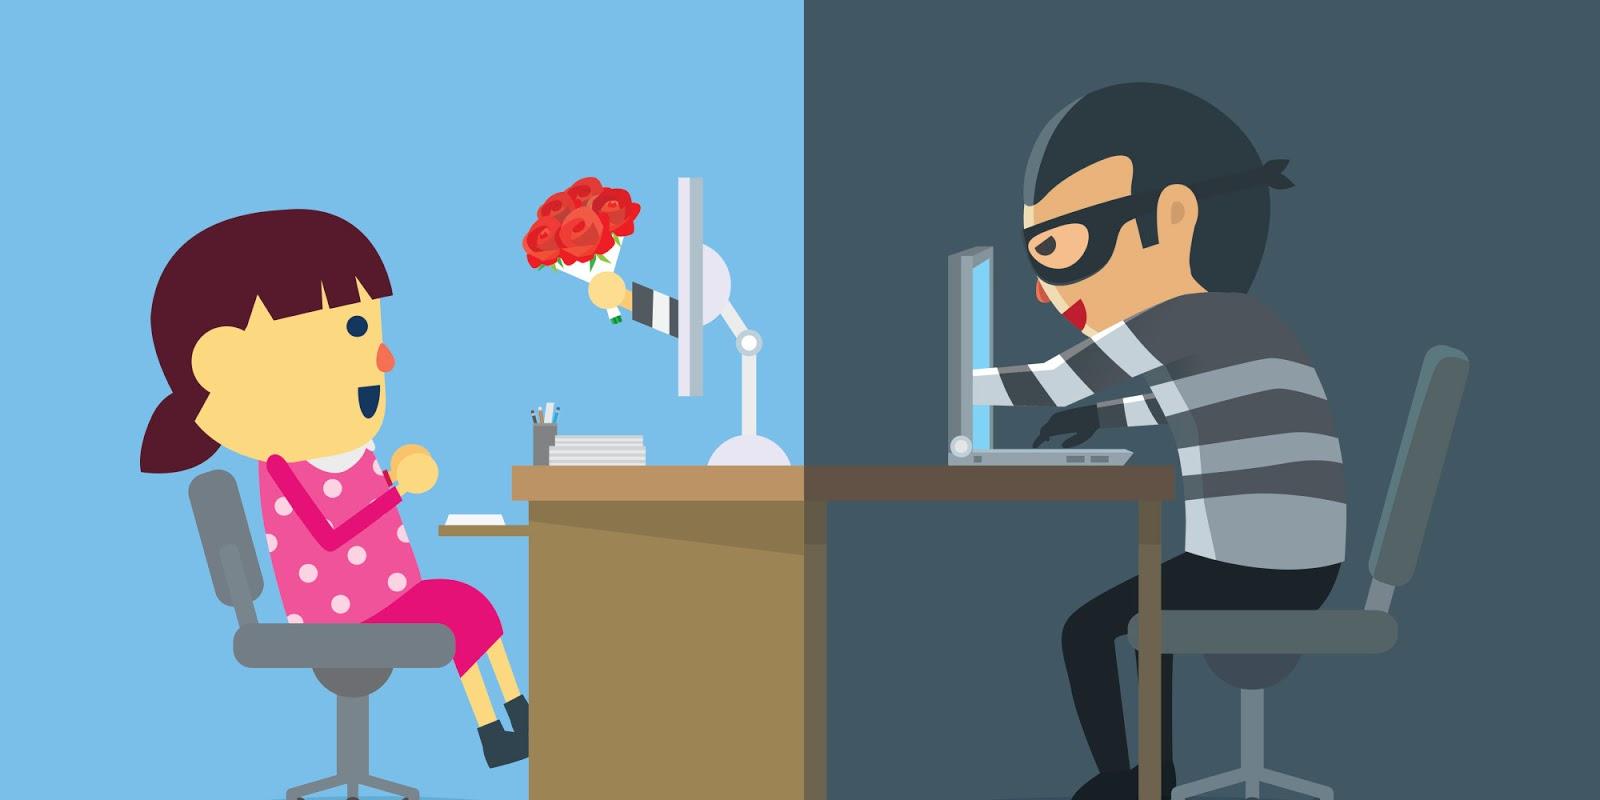 The hazards of online dating